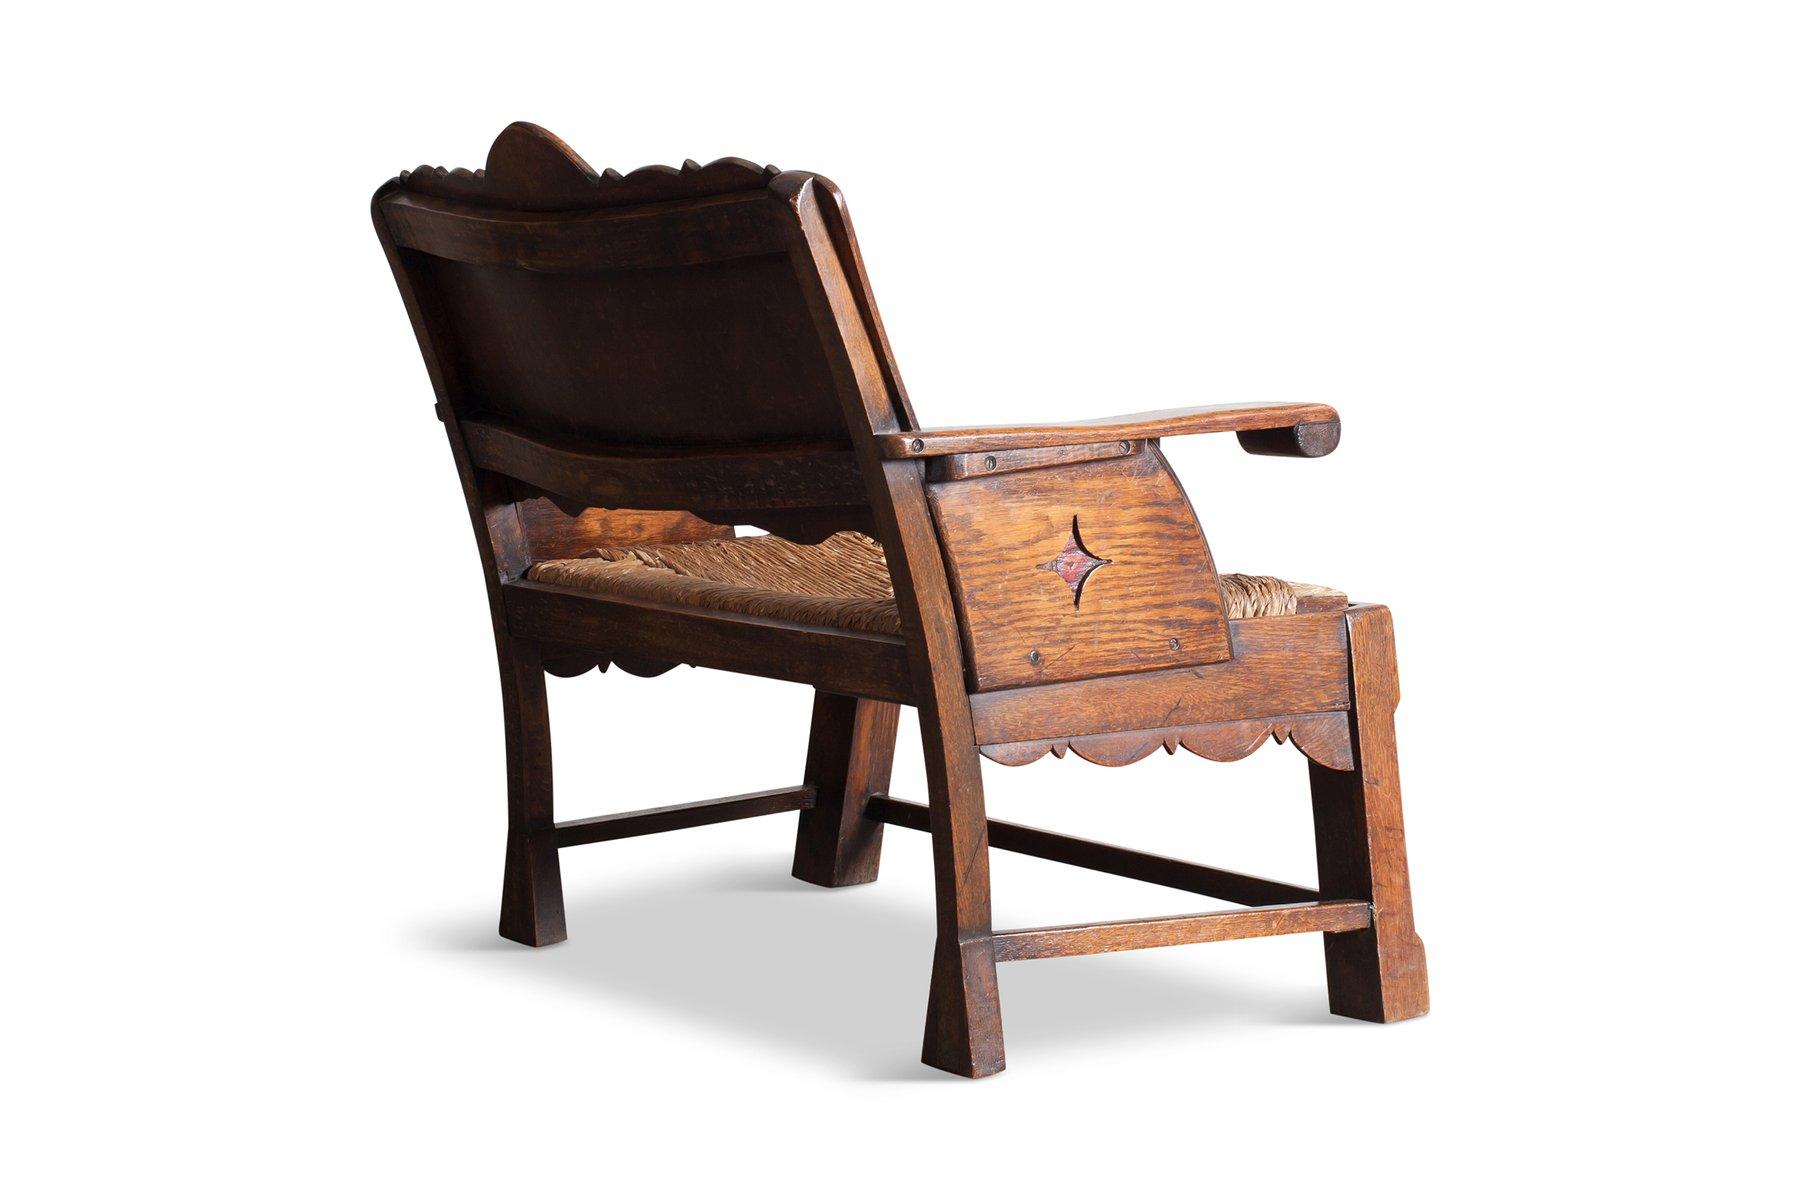 Antique Lounge Chair 8. £3,234.00